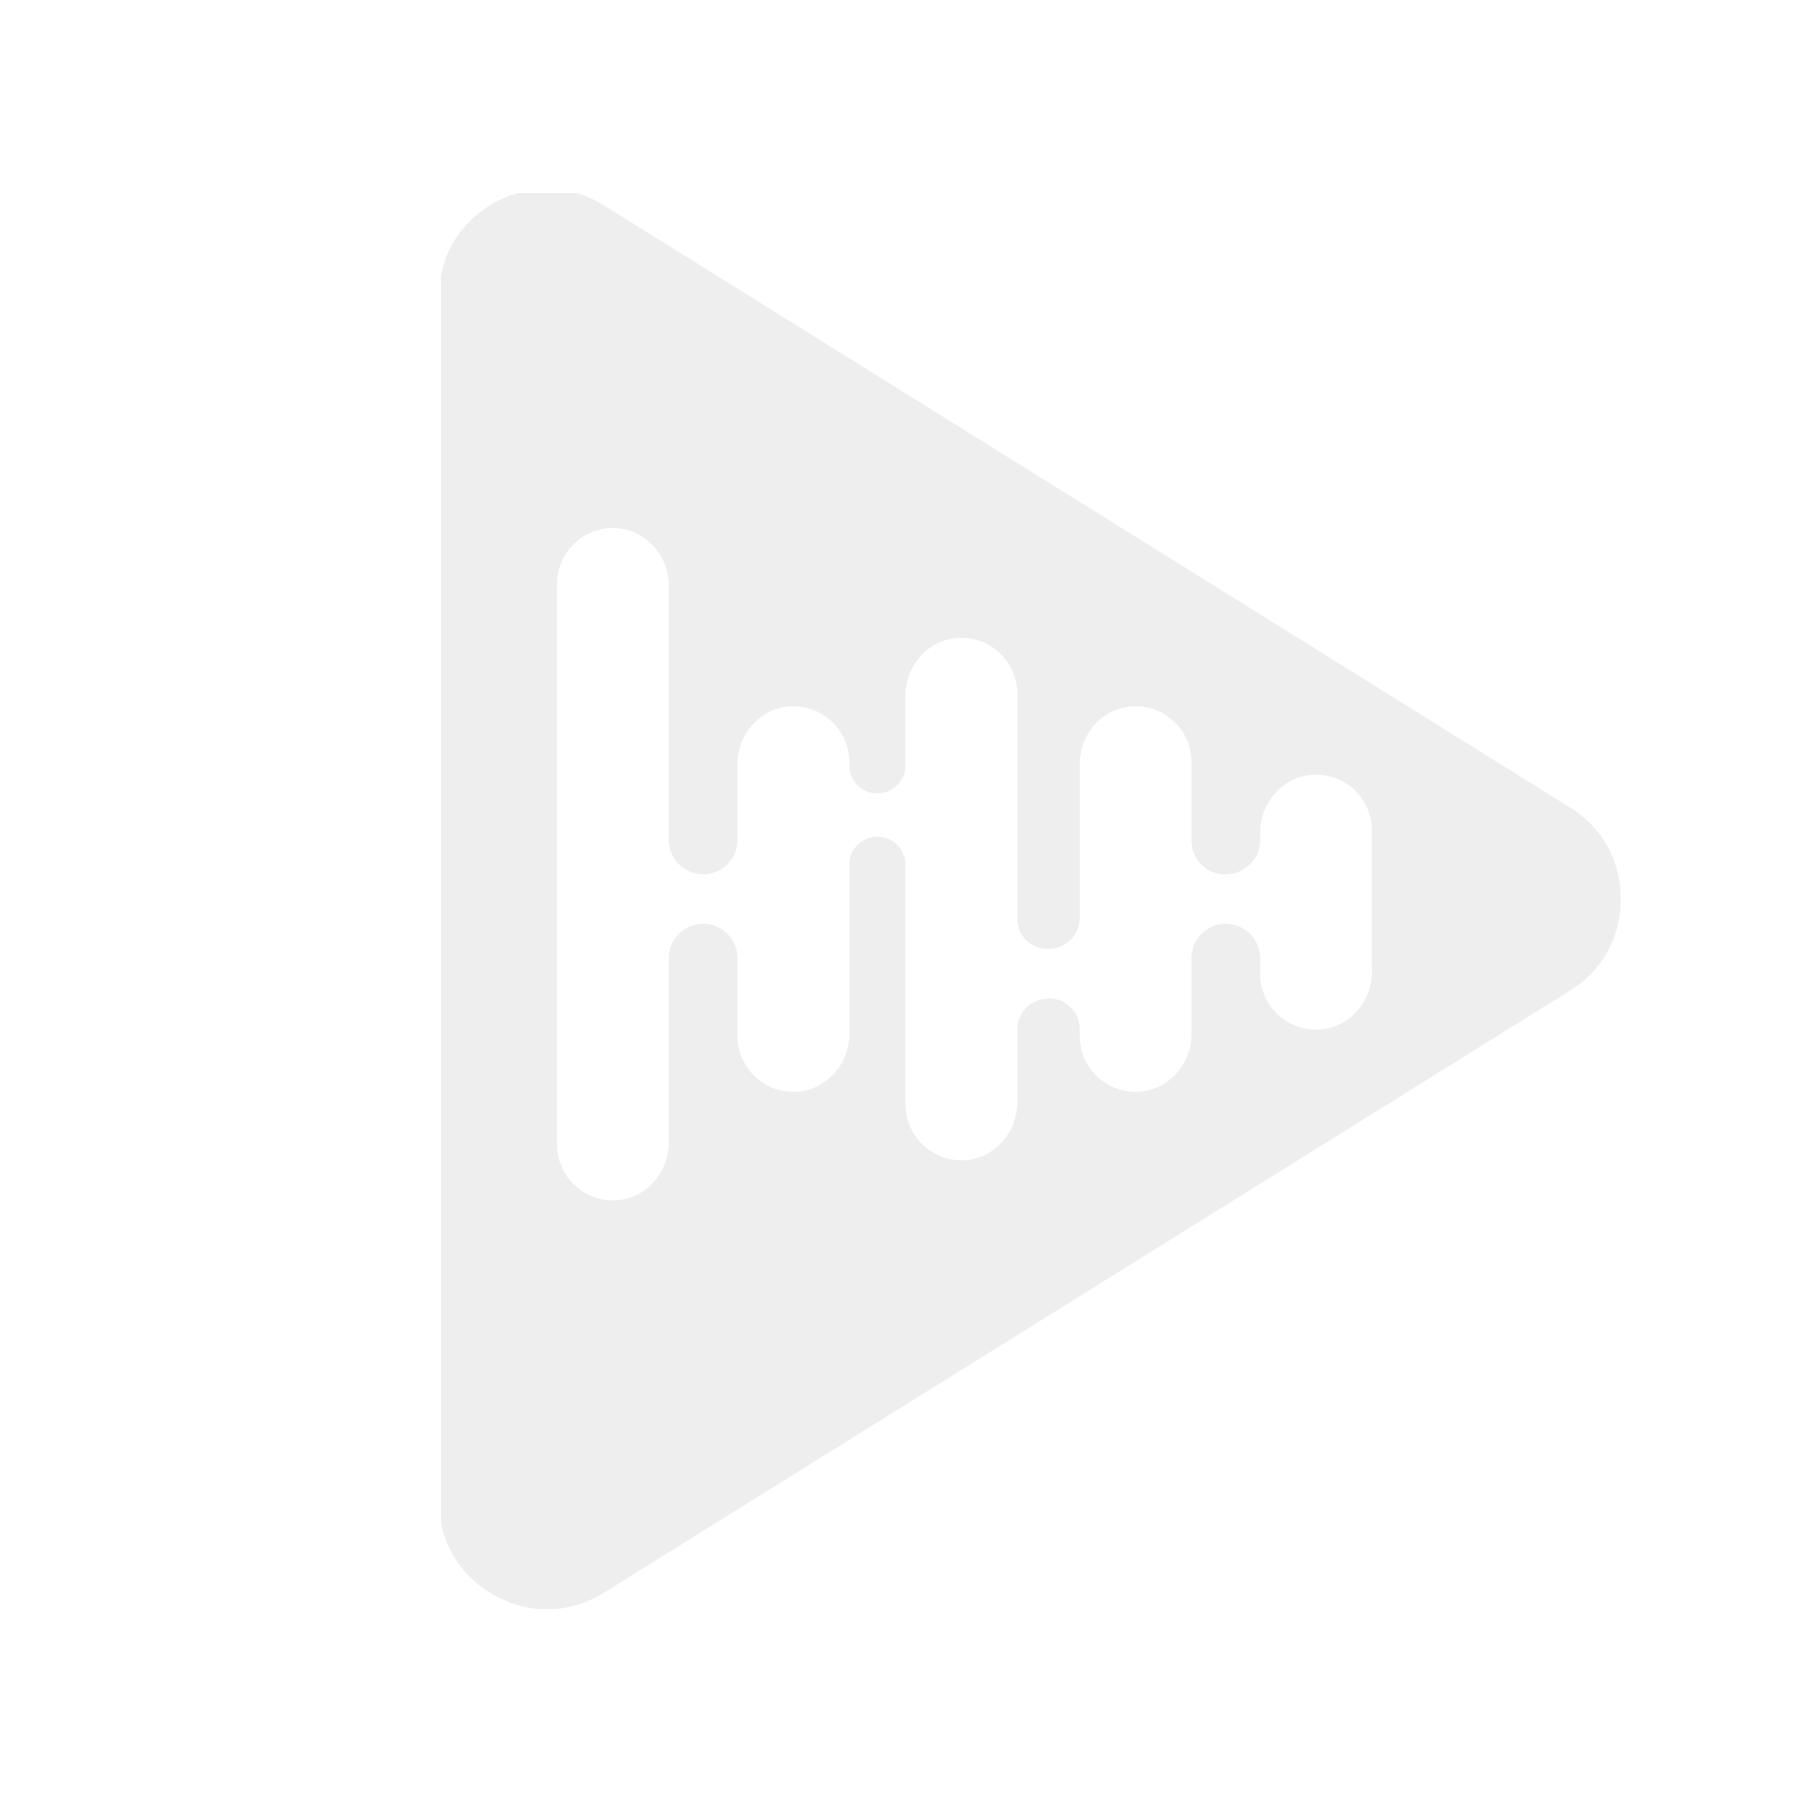 Bandridge BCL4101 USB A-B Device Cable 1m